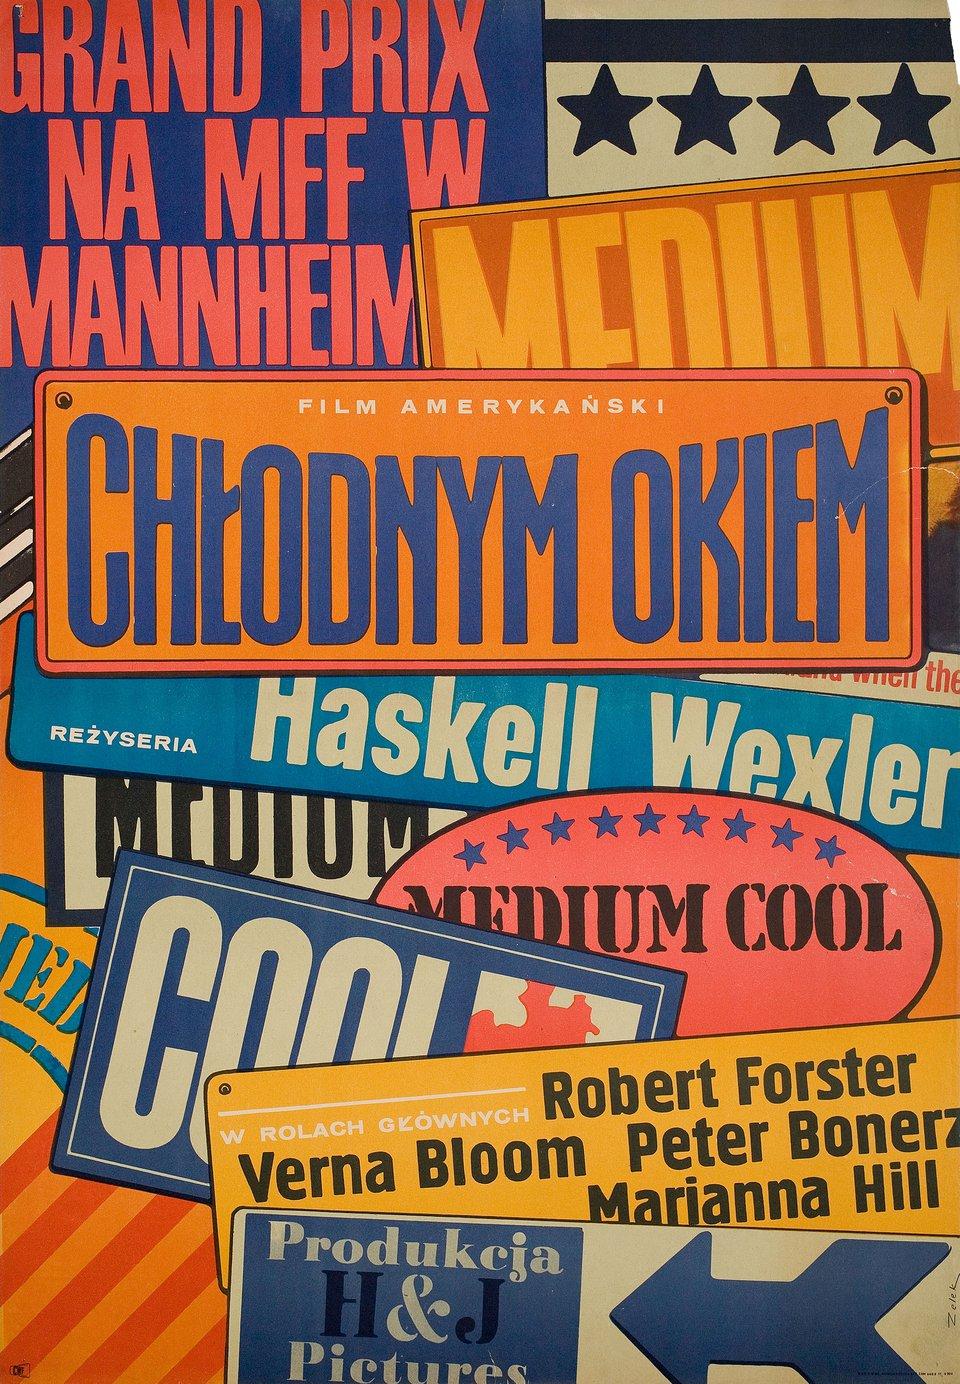 Medium Cool 1969 Polish A1 Poster